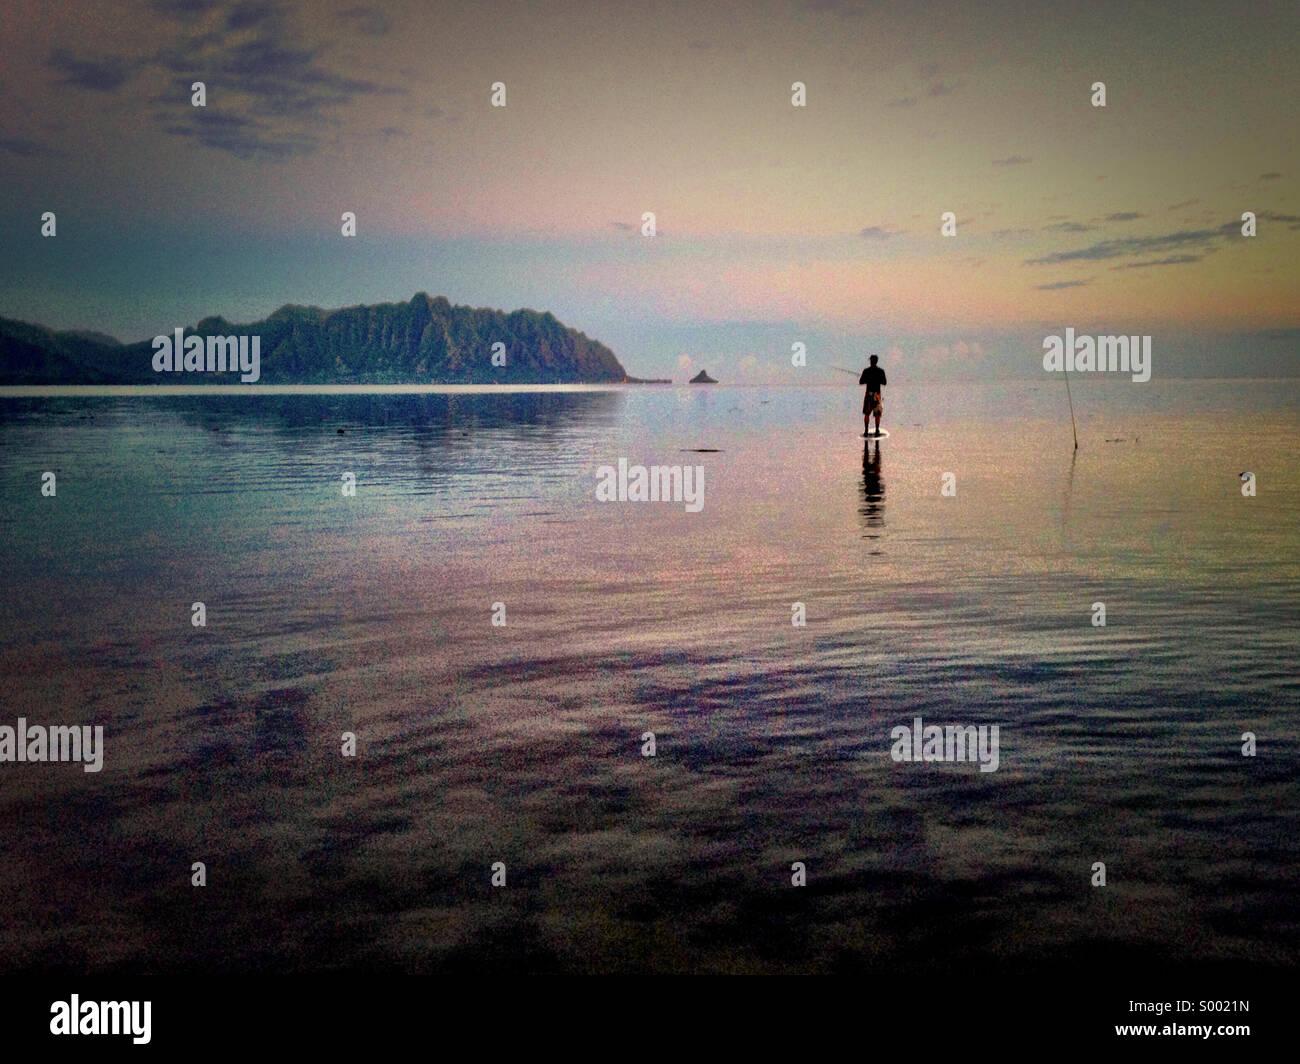 Stand up junta de pesca en la bahía Kaneohe Bay, Oahu, Hawaii. Las montañas Koolau Kualoa como telón Imagen De Stock